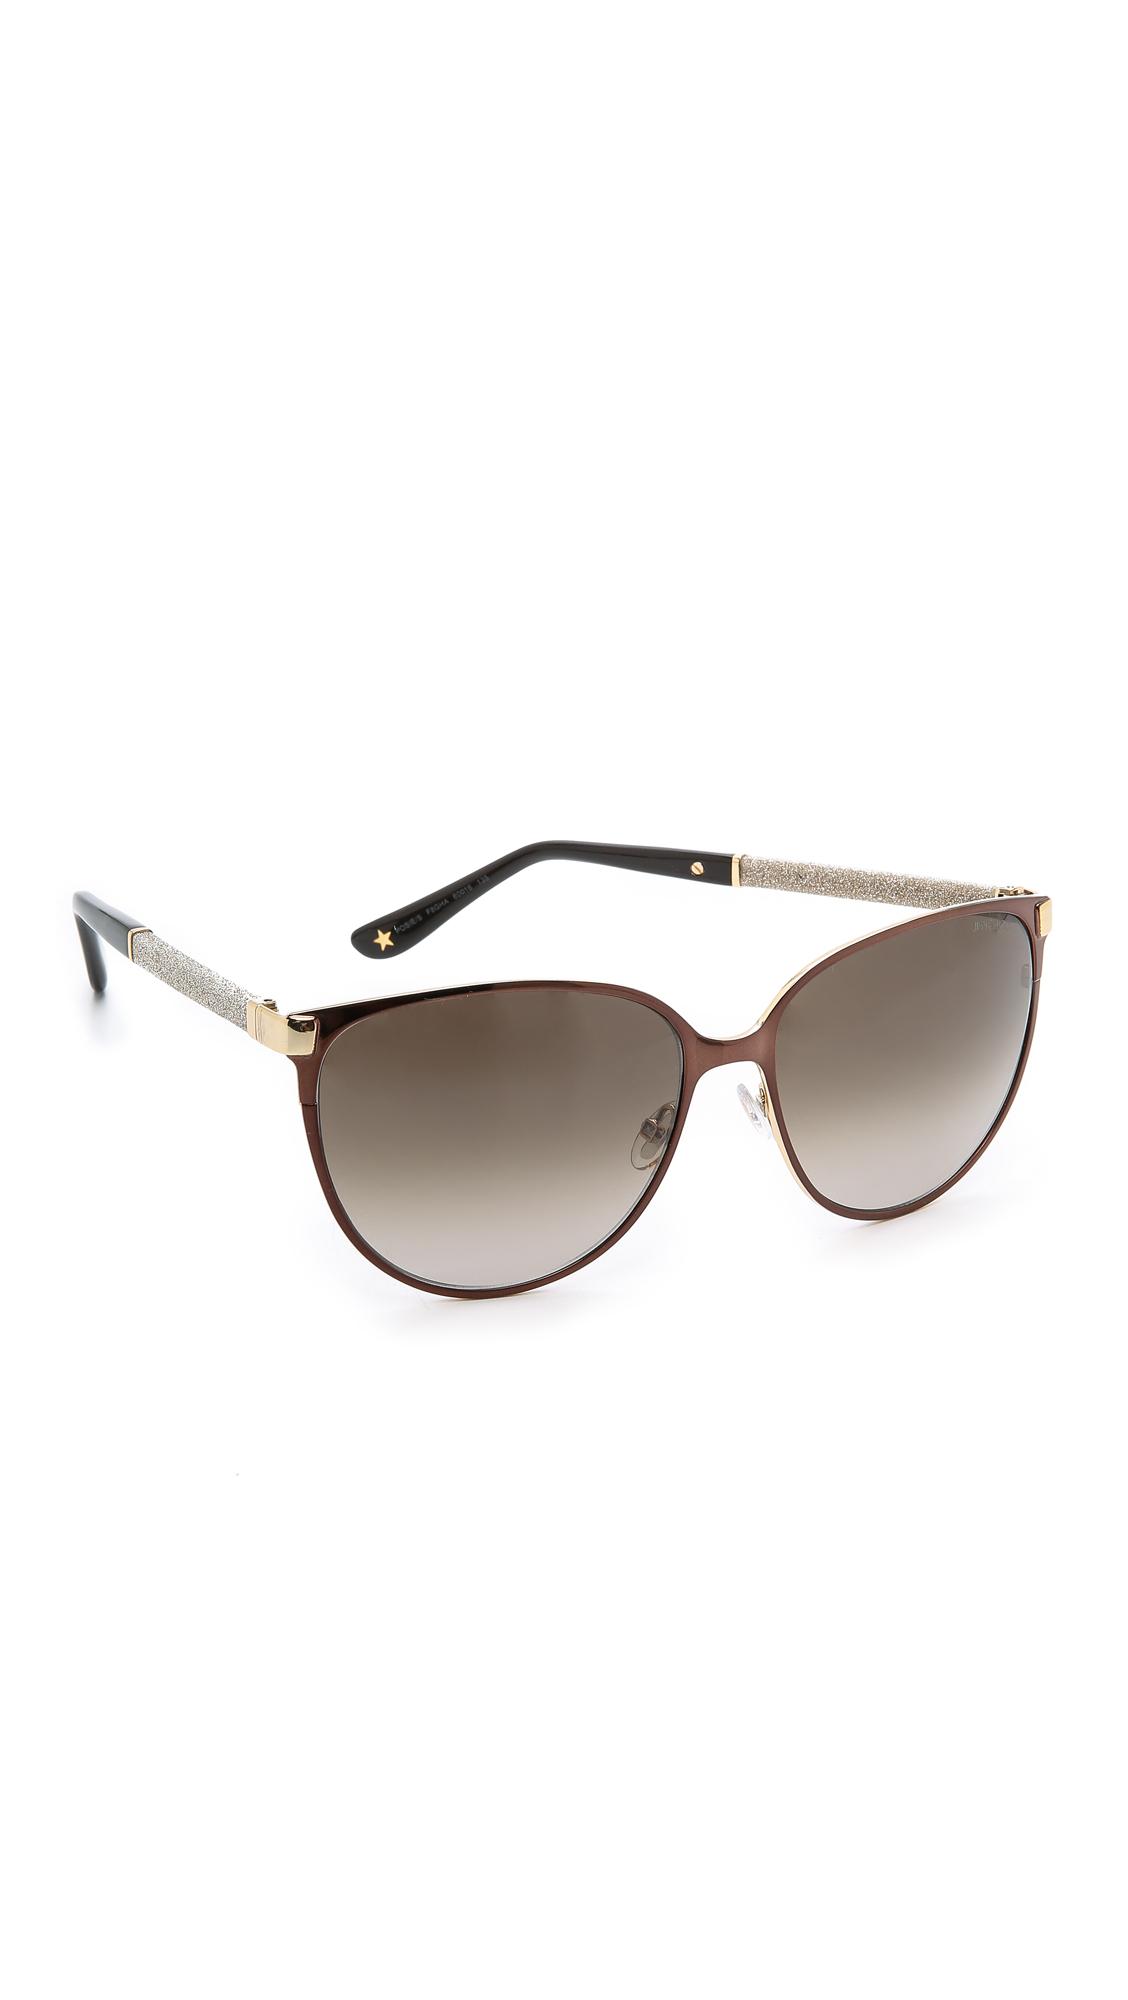 f5bd0e60fb6 Lyst - Jimmy Choo Posie Sunglasses - Ivory brown in Brown